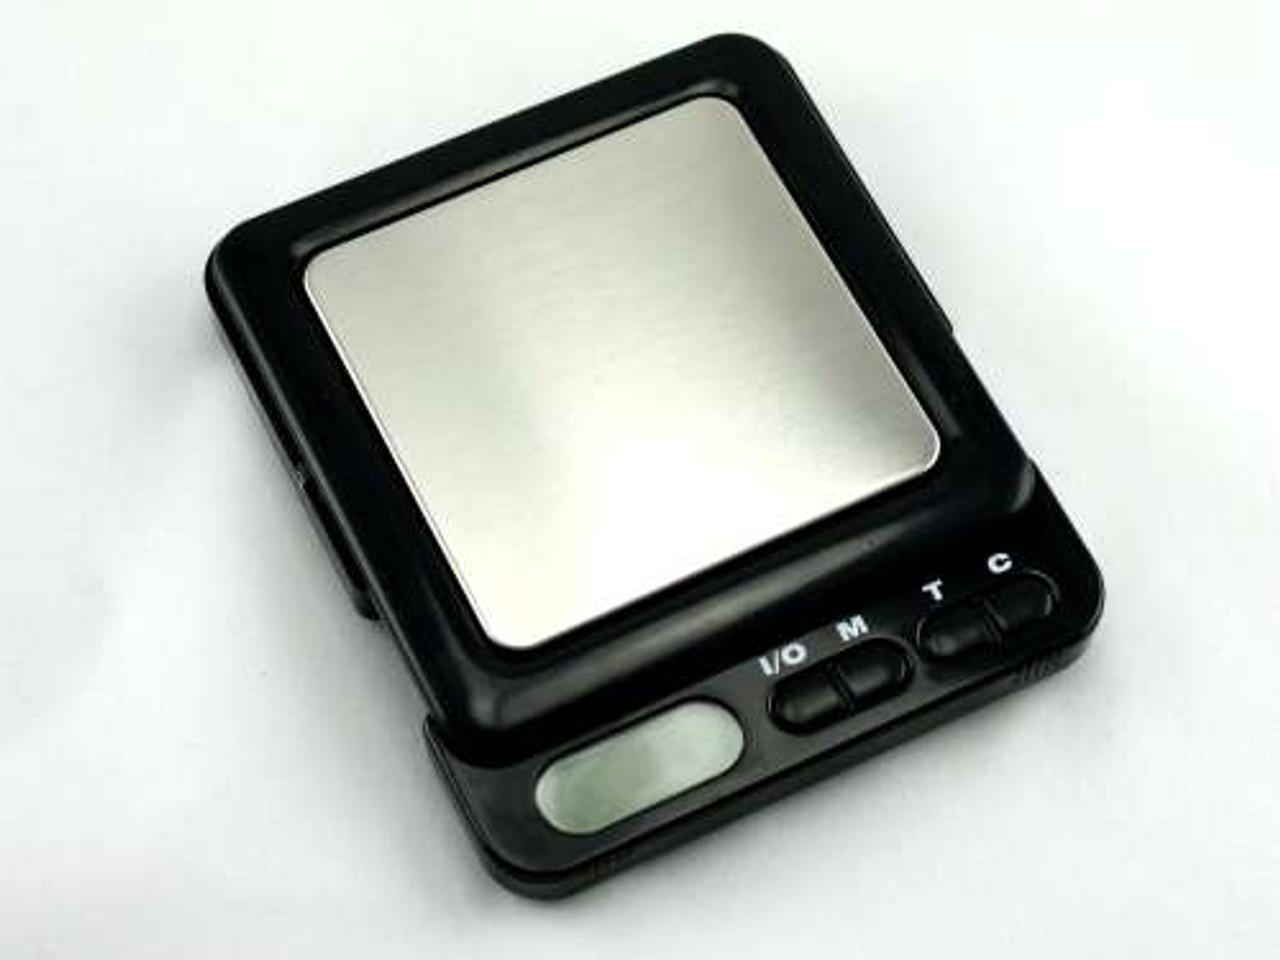 Fuzion Xtreme Professional Digital Pocket Scale